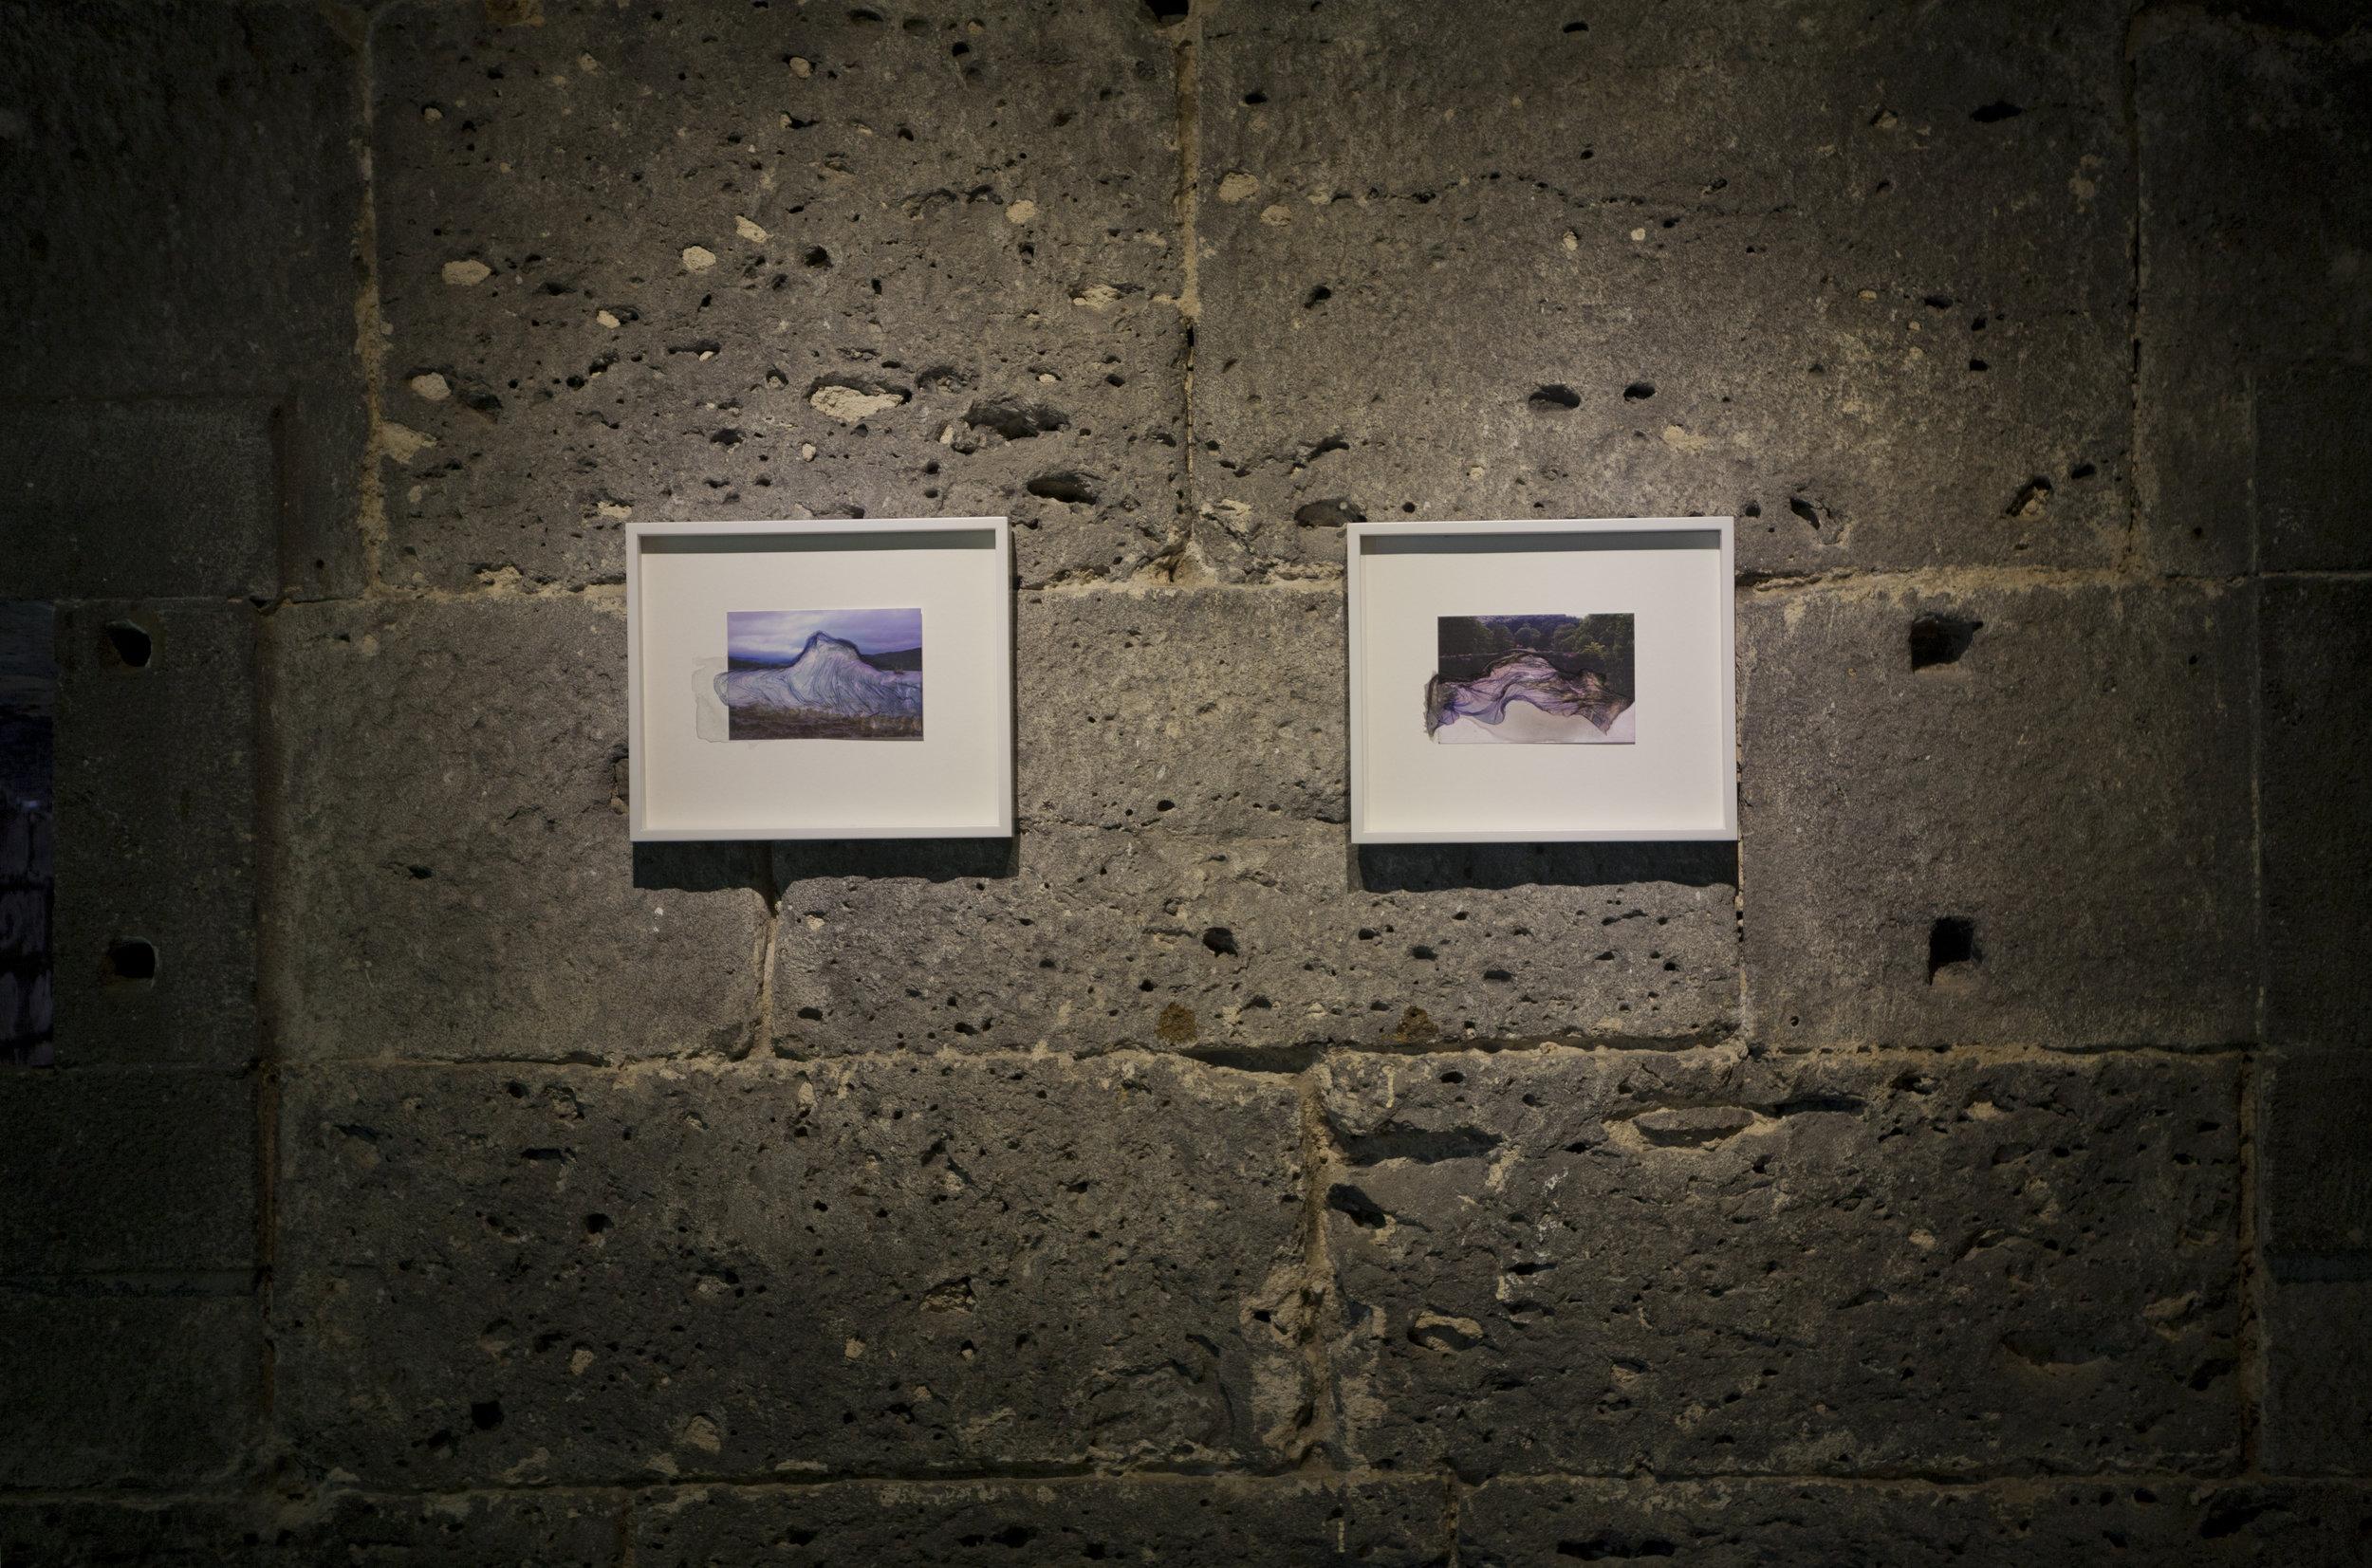 Alexander Duncan,  water drawings ,  Edge Effects,  La Citadelle, Mauritius,2016